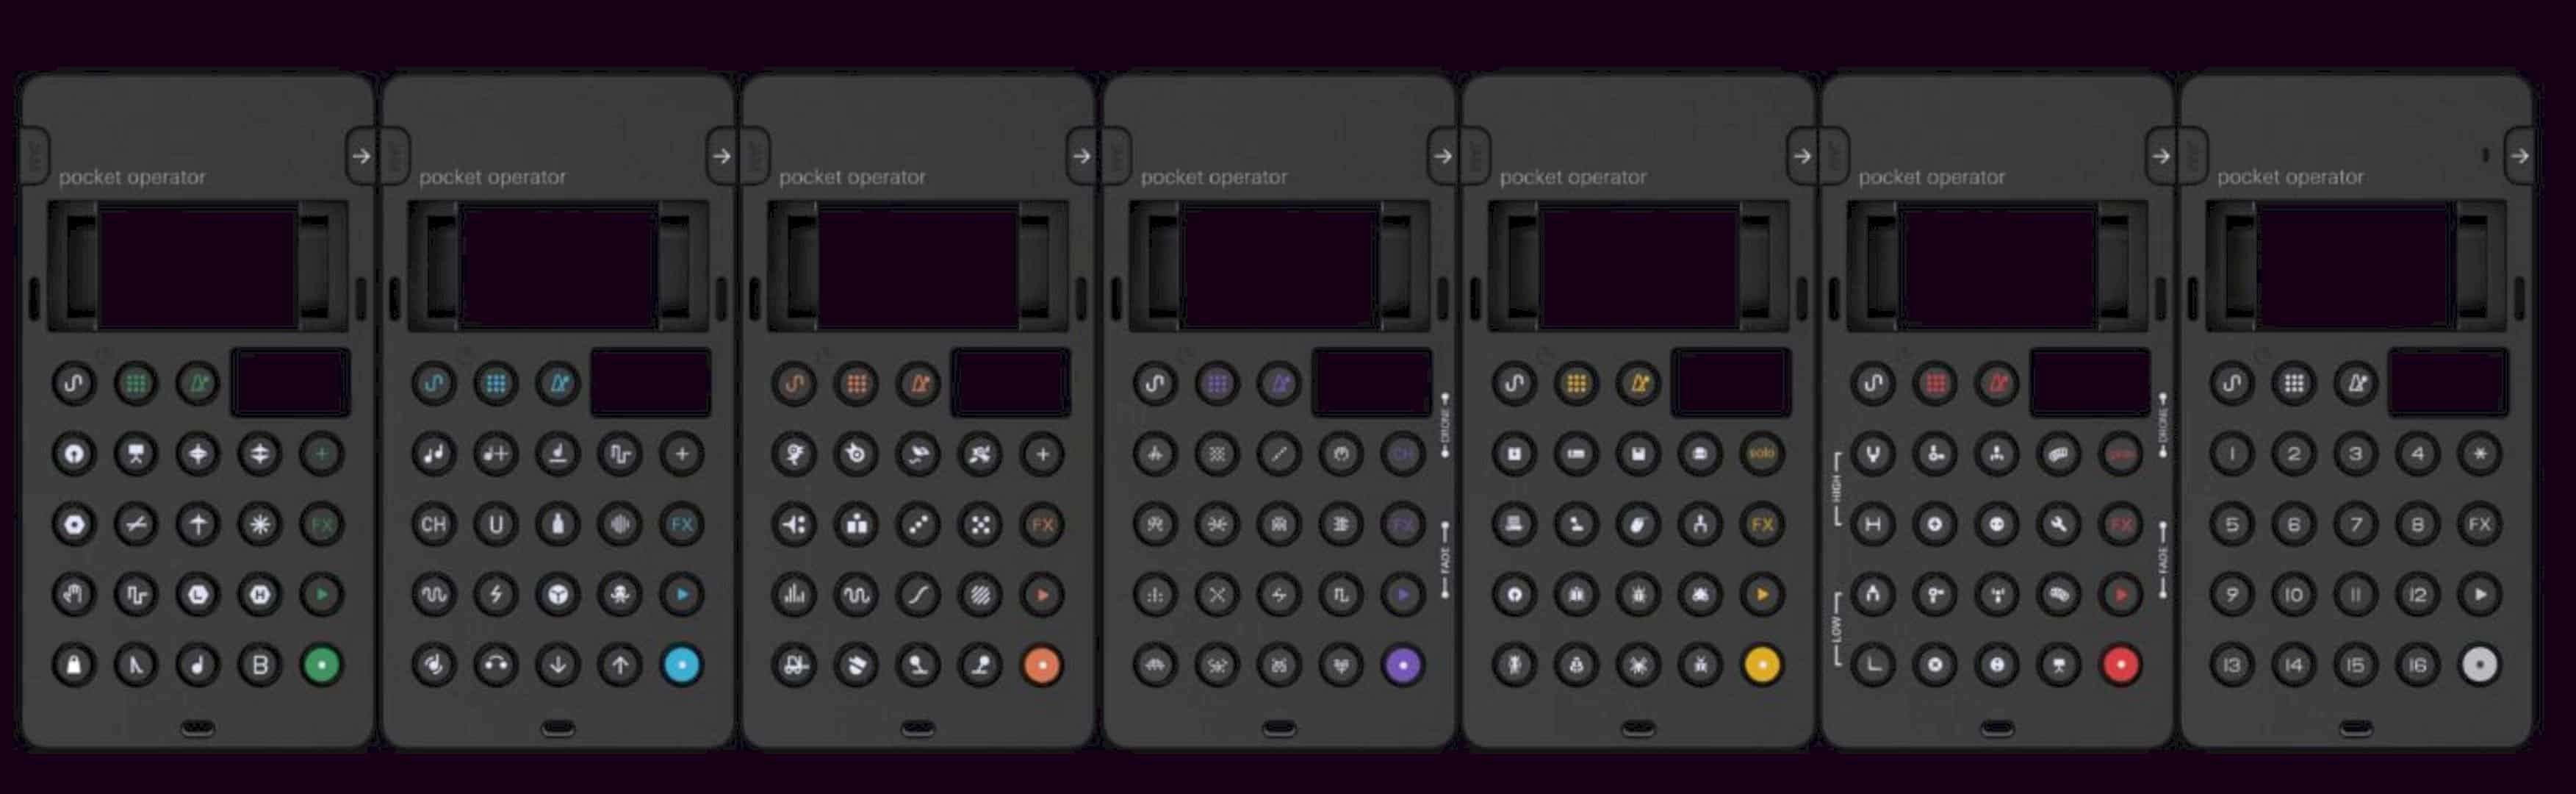 Pocket Operators 14